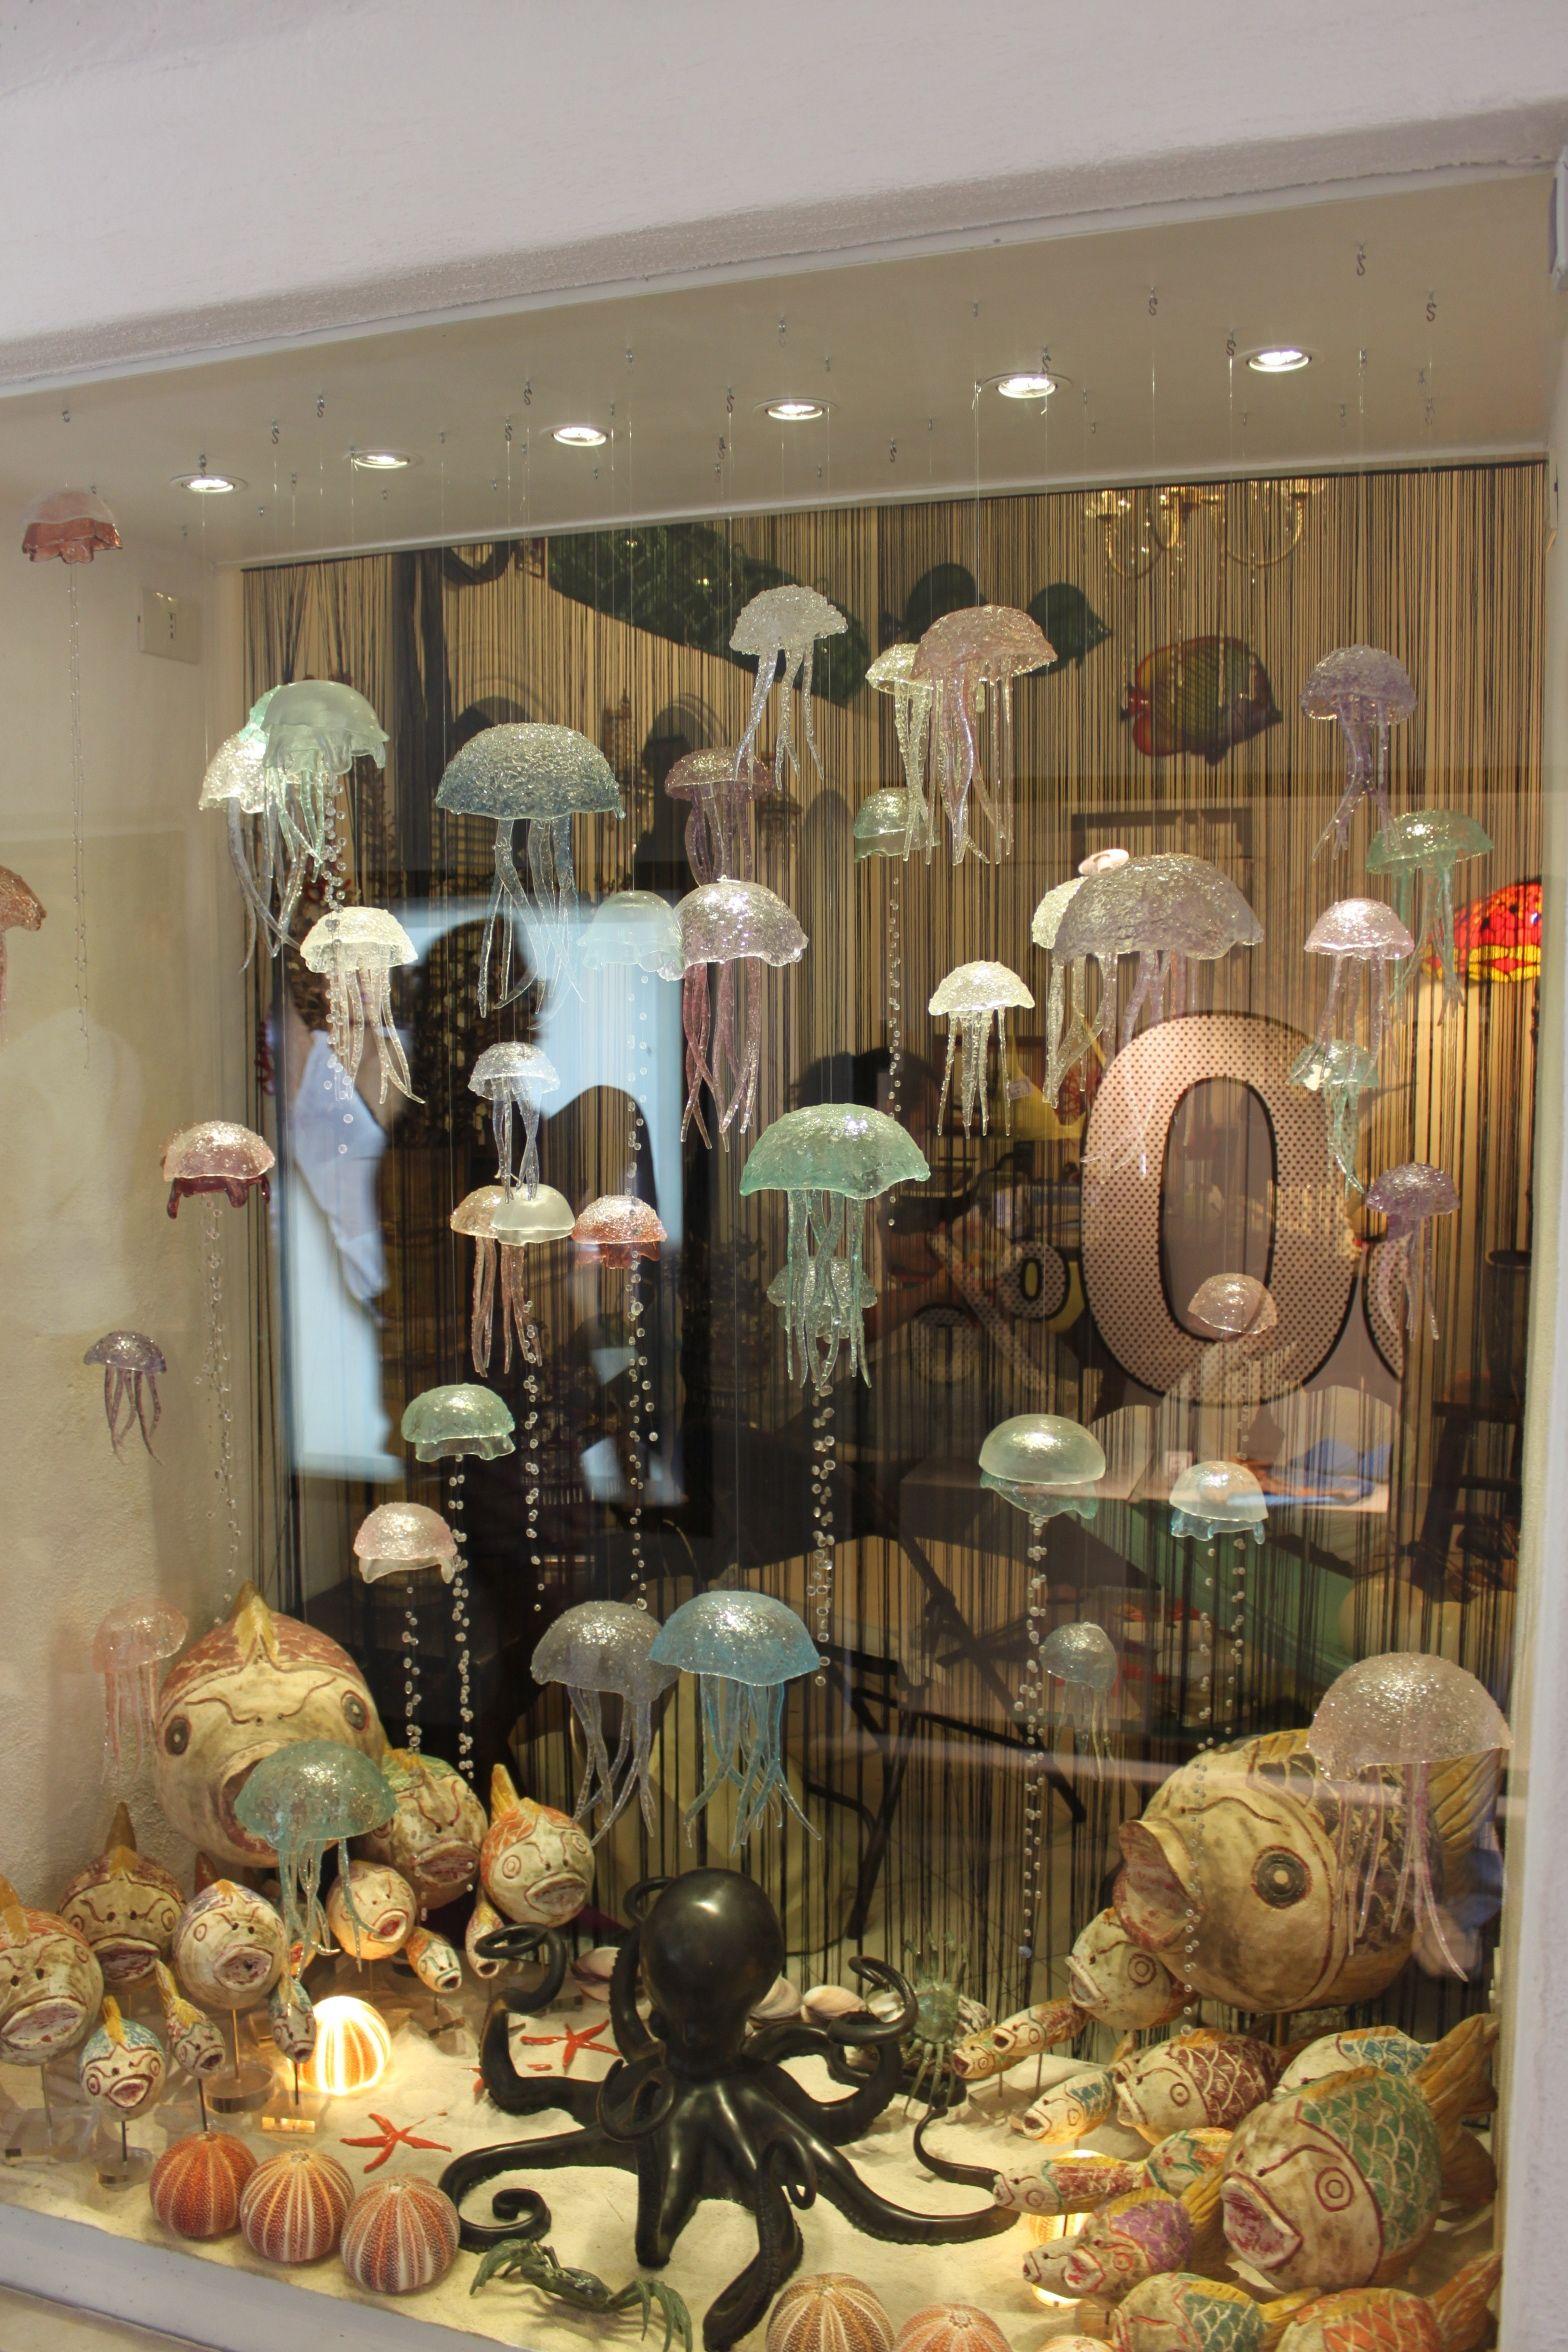 3 way displays whirlpool washing machine wiring diagram floating glass jelly fish window display shops